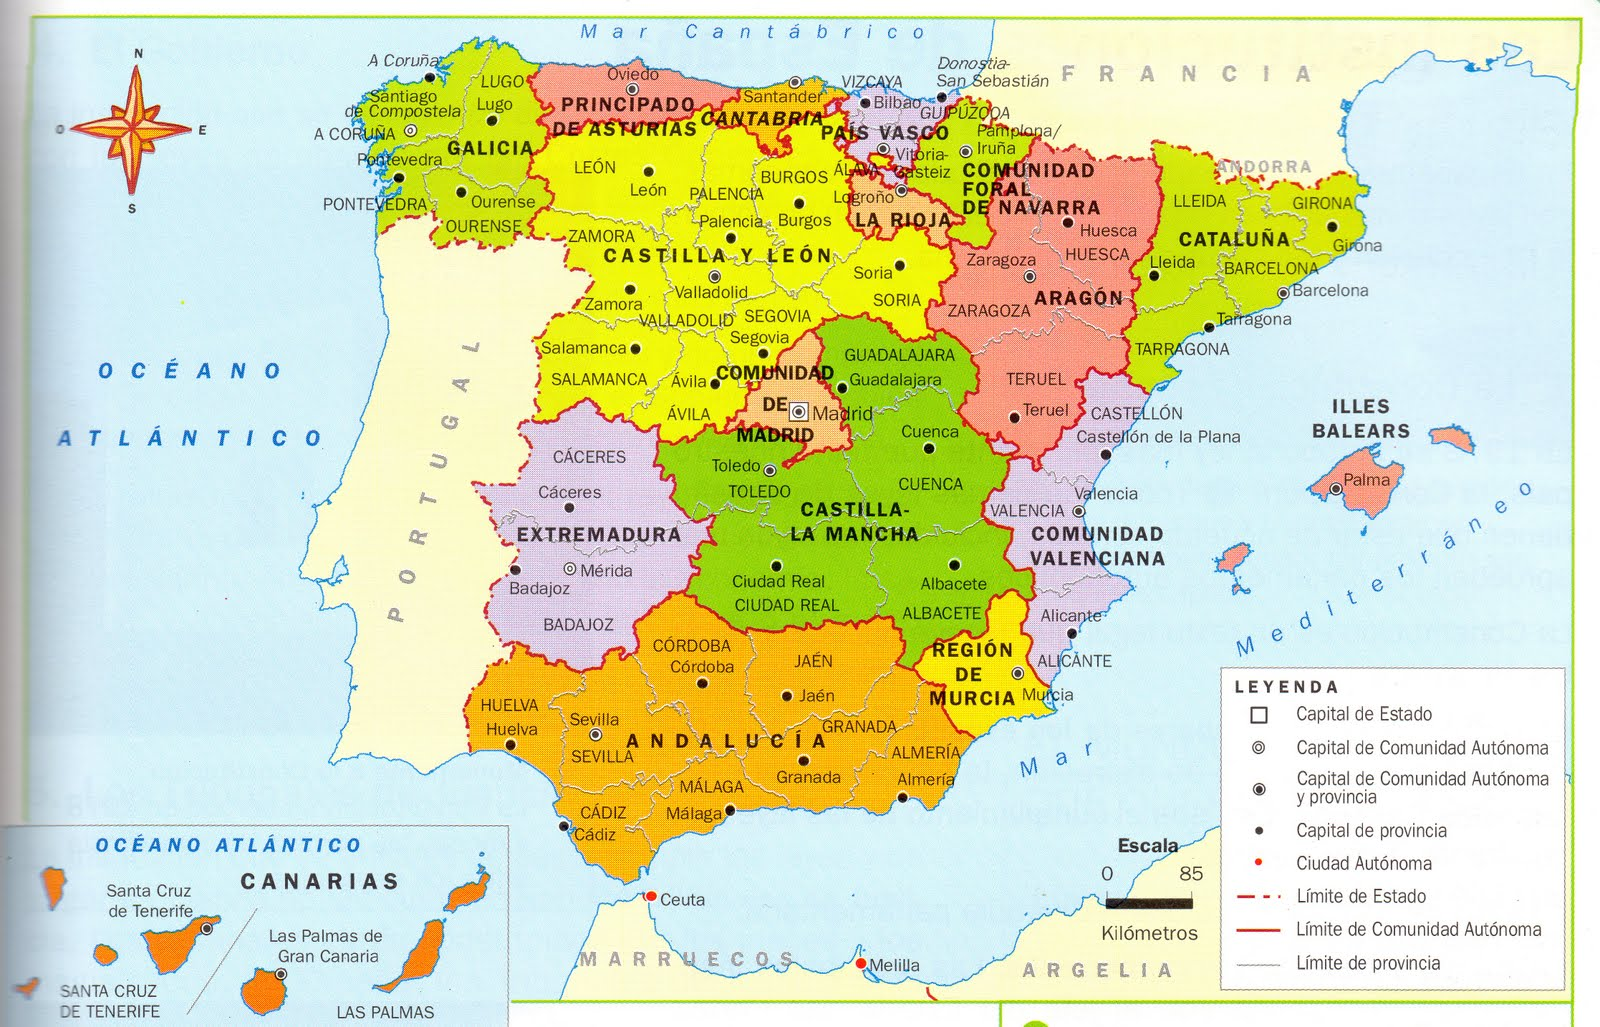 Antonio Alonso España Geografia: Mapa de las Comunidades Autónomas